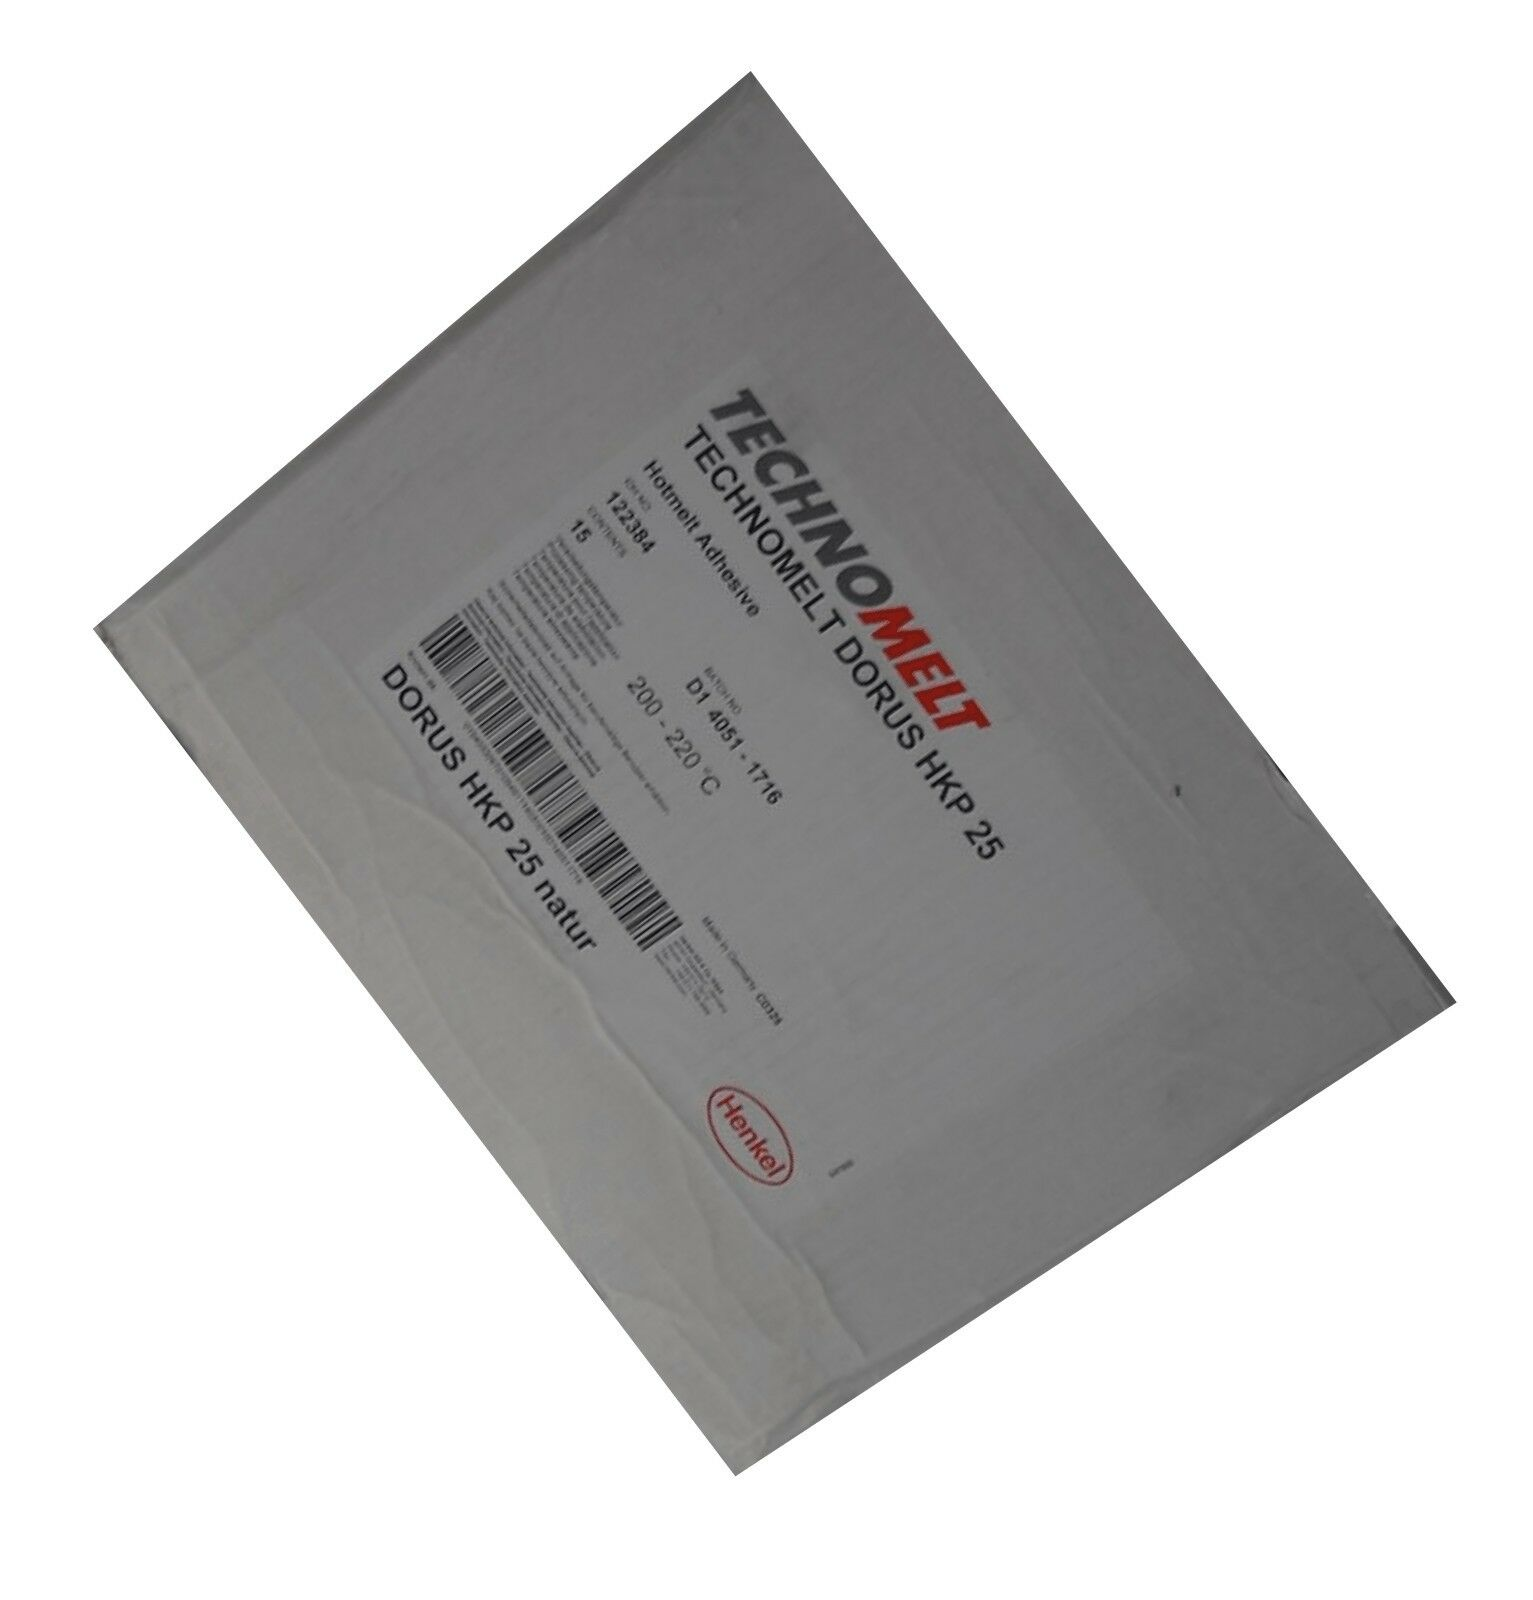 Technomelt Dorus HKP 25 15kg Schmelzklebstoff natur Kantenumleimer Patronen